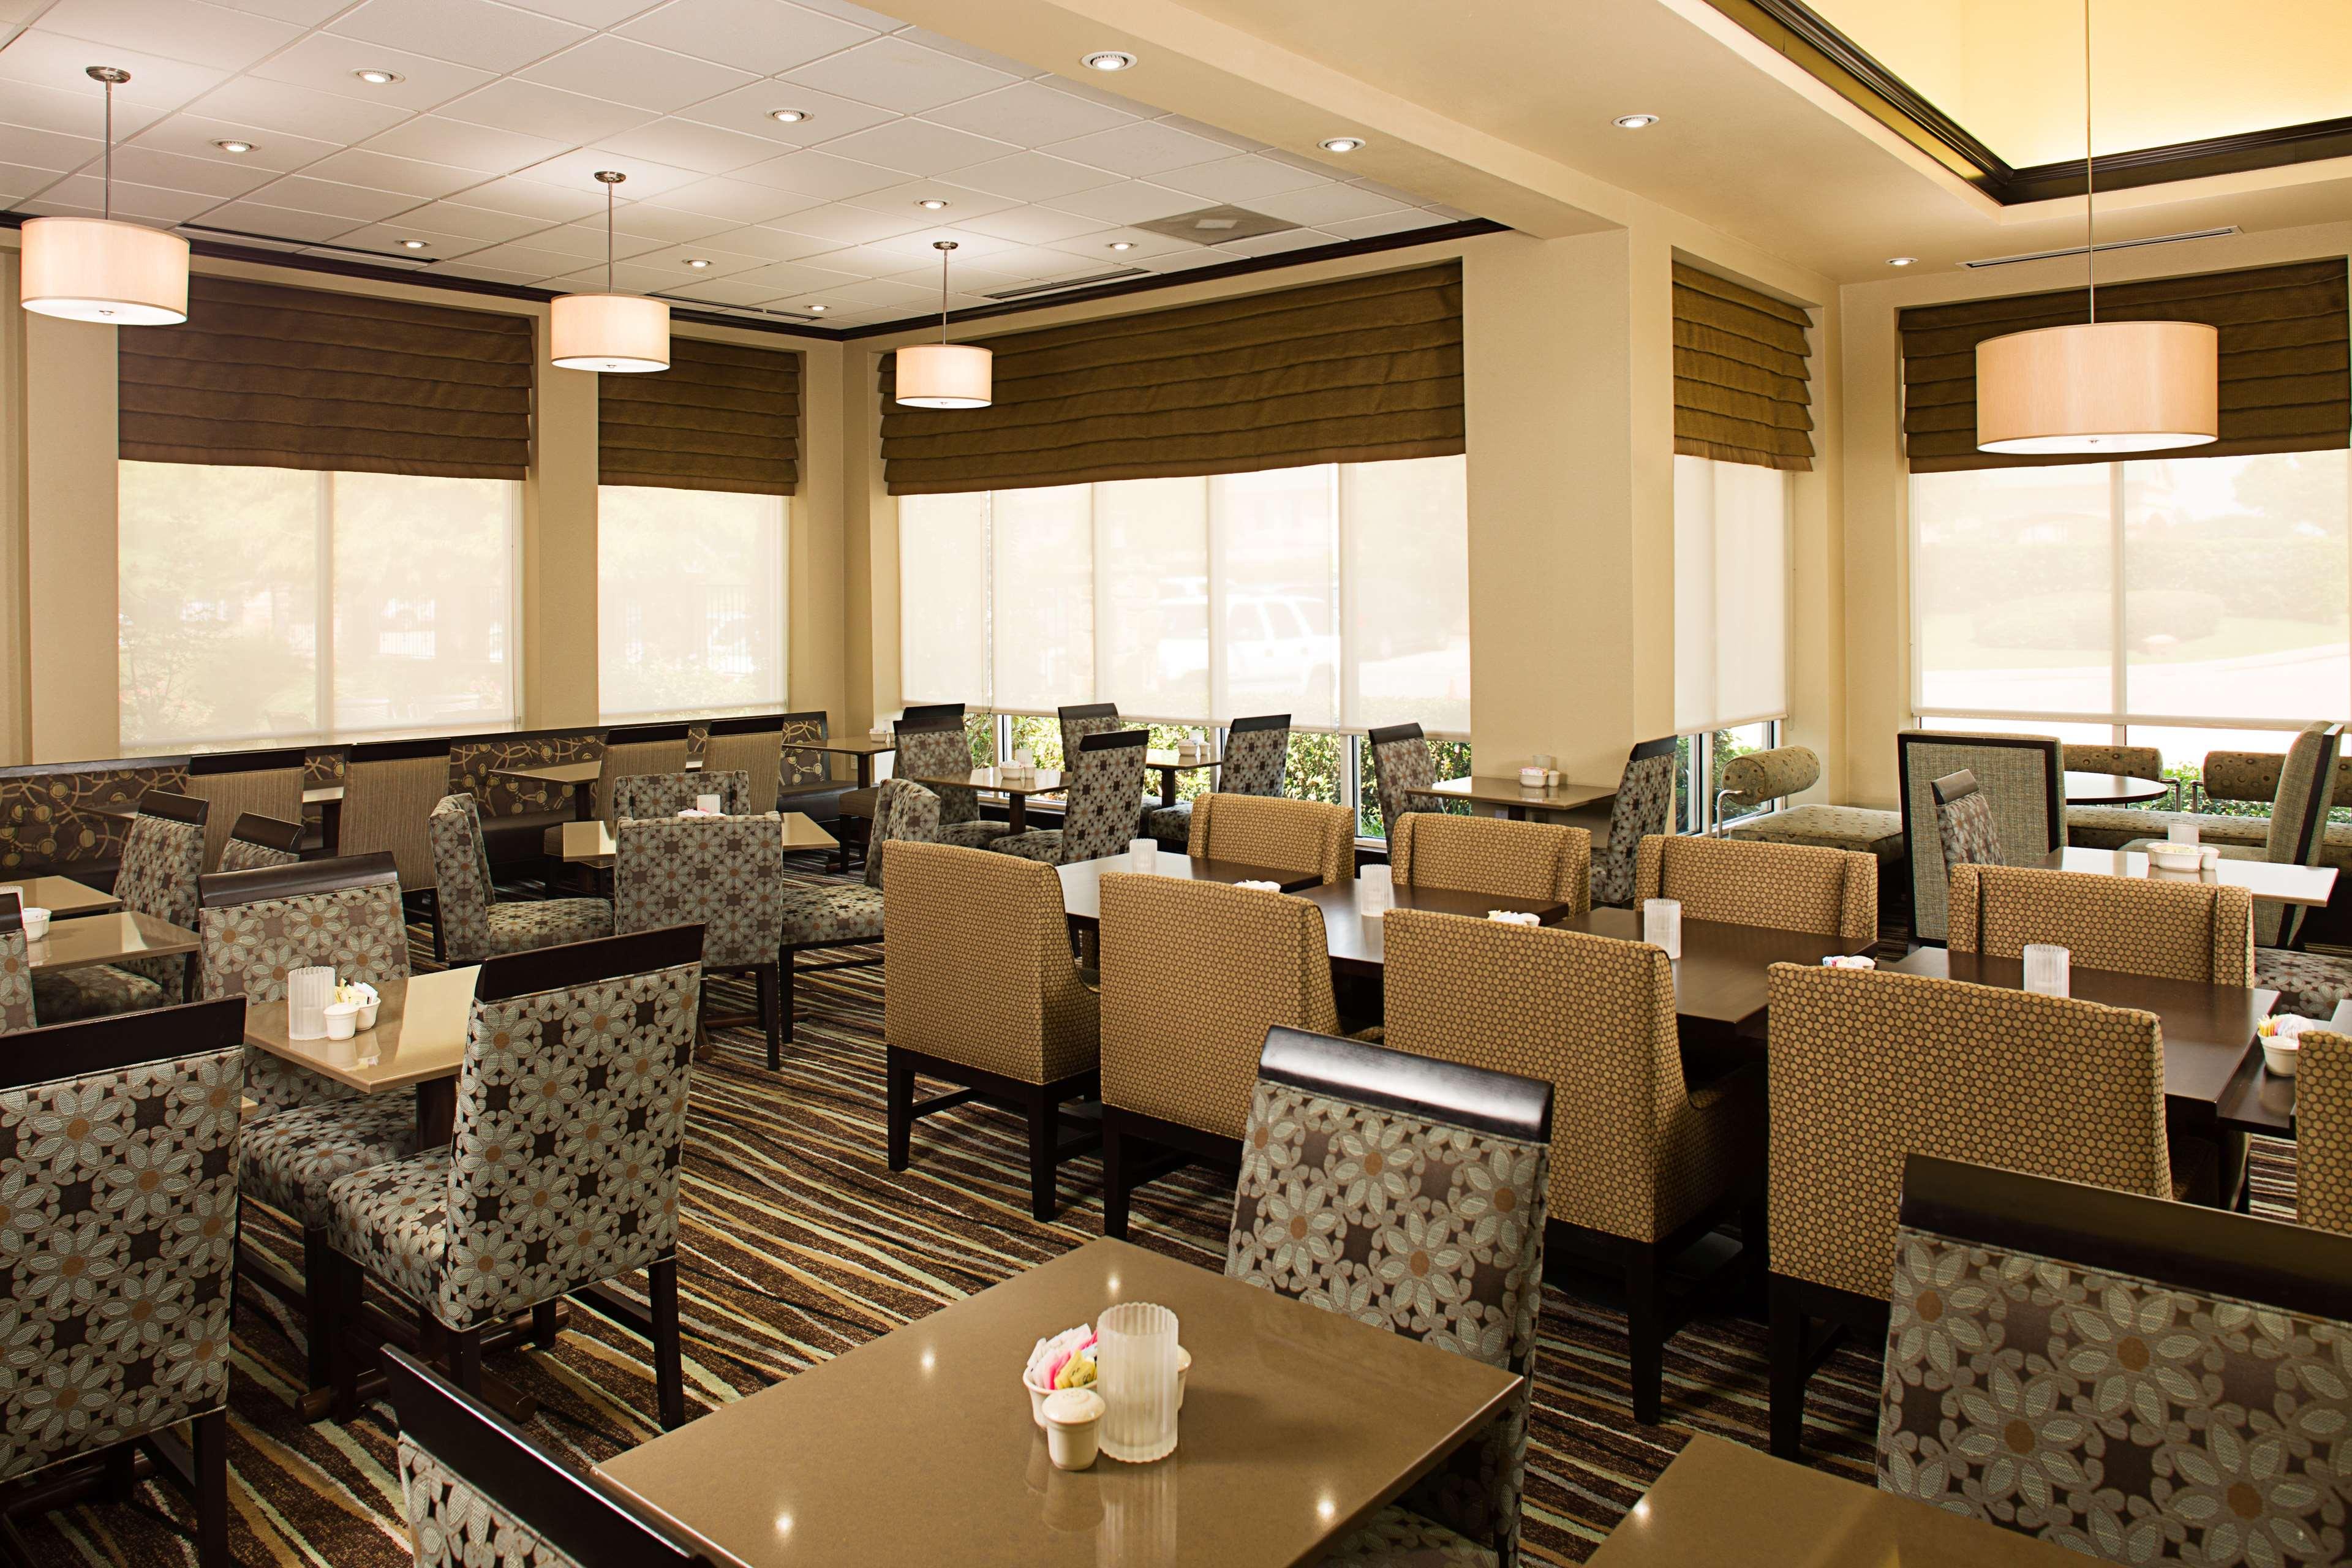 Hilton Garden Inn DFW Airport South image 16